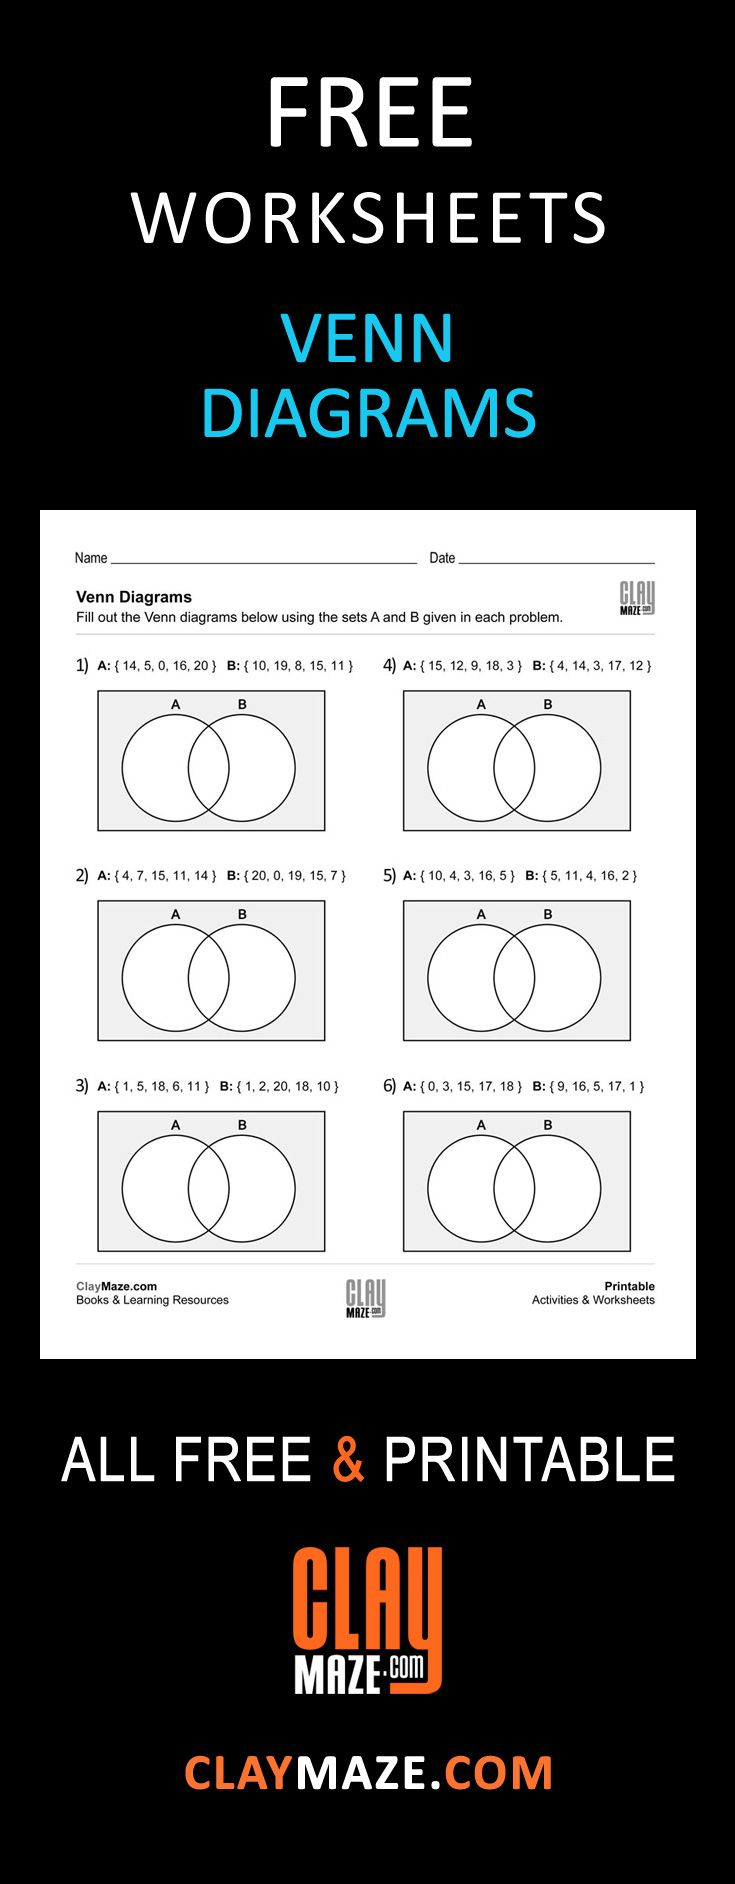 Free, Printable Venn Diagrams Worksheet - These Are Good For   Free Printable Venn Diagram Math Worksheets